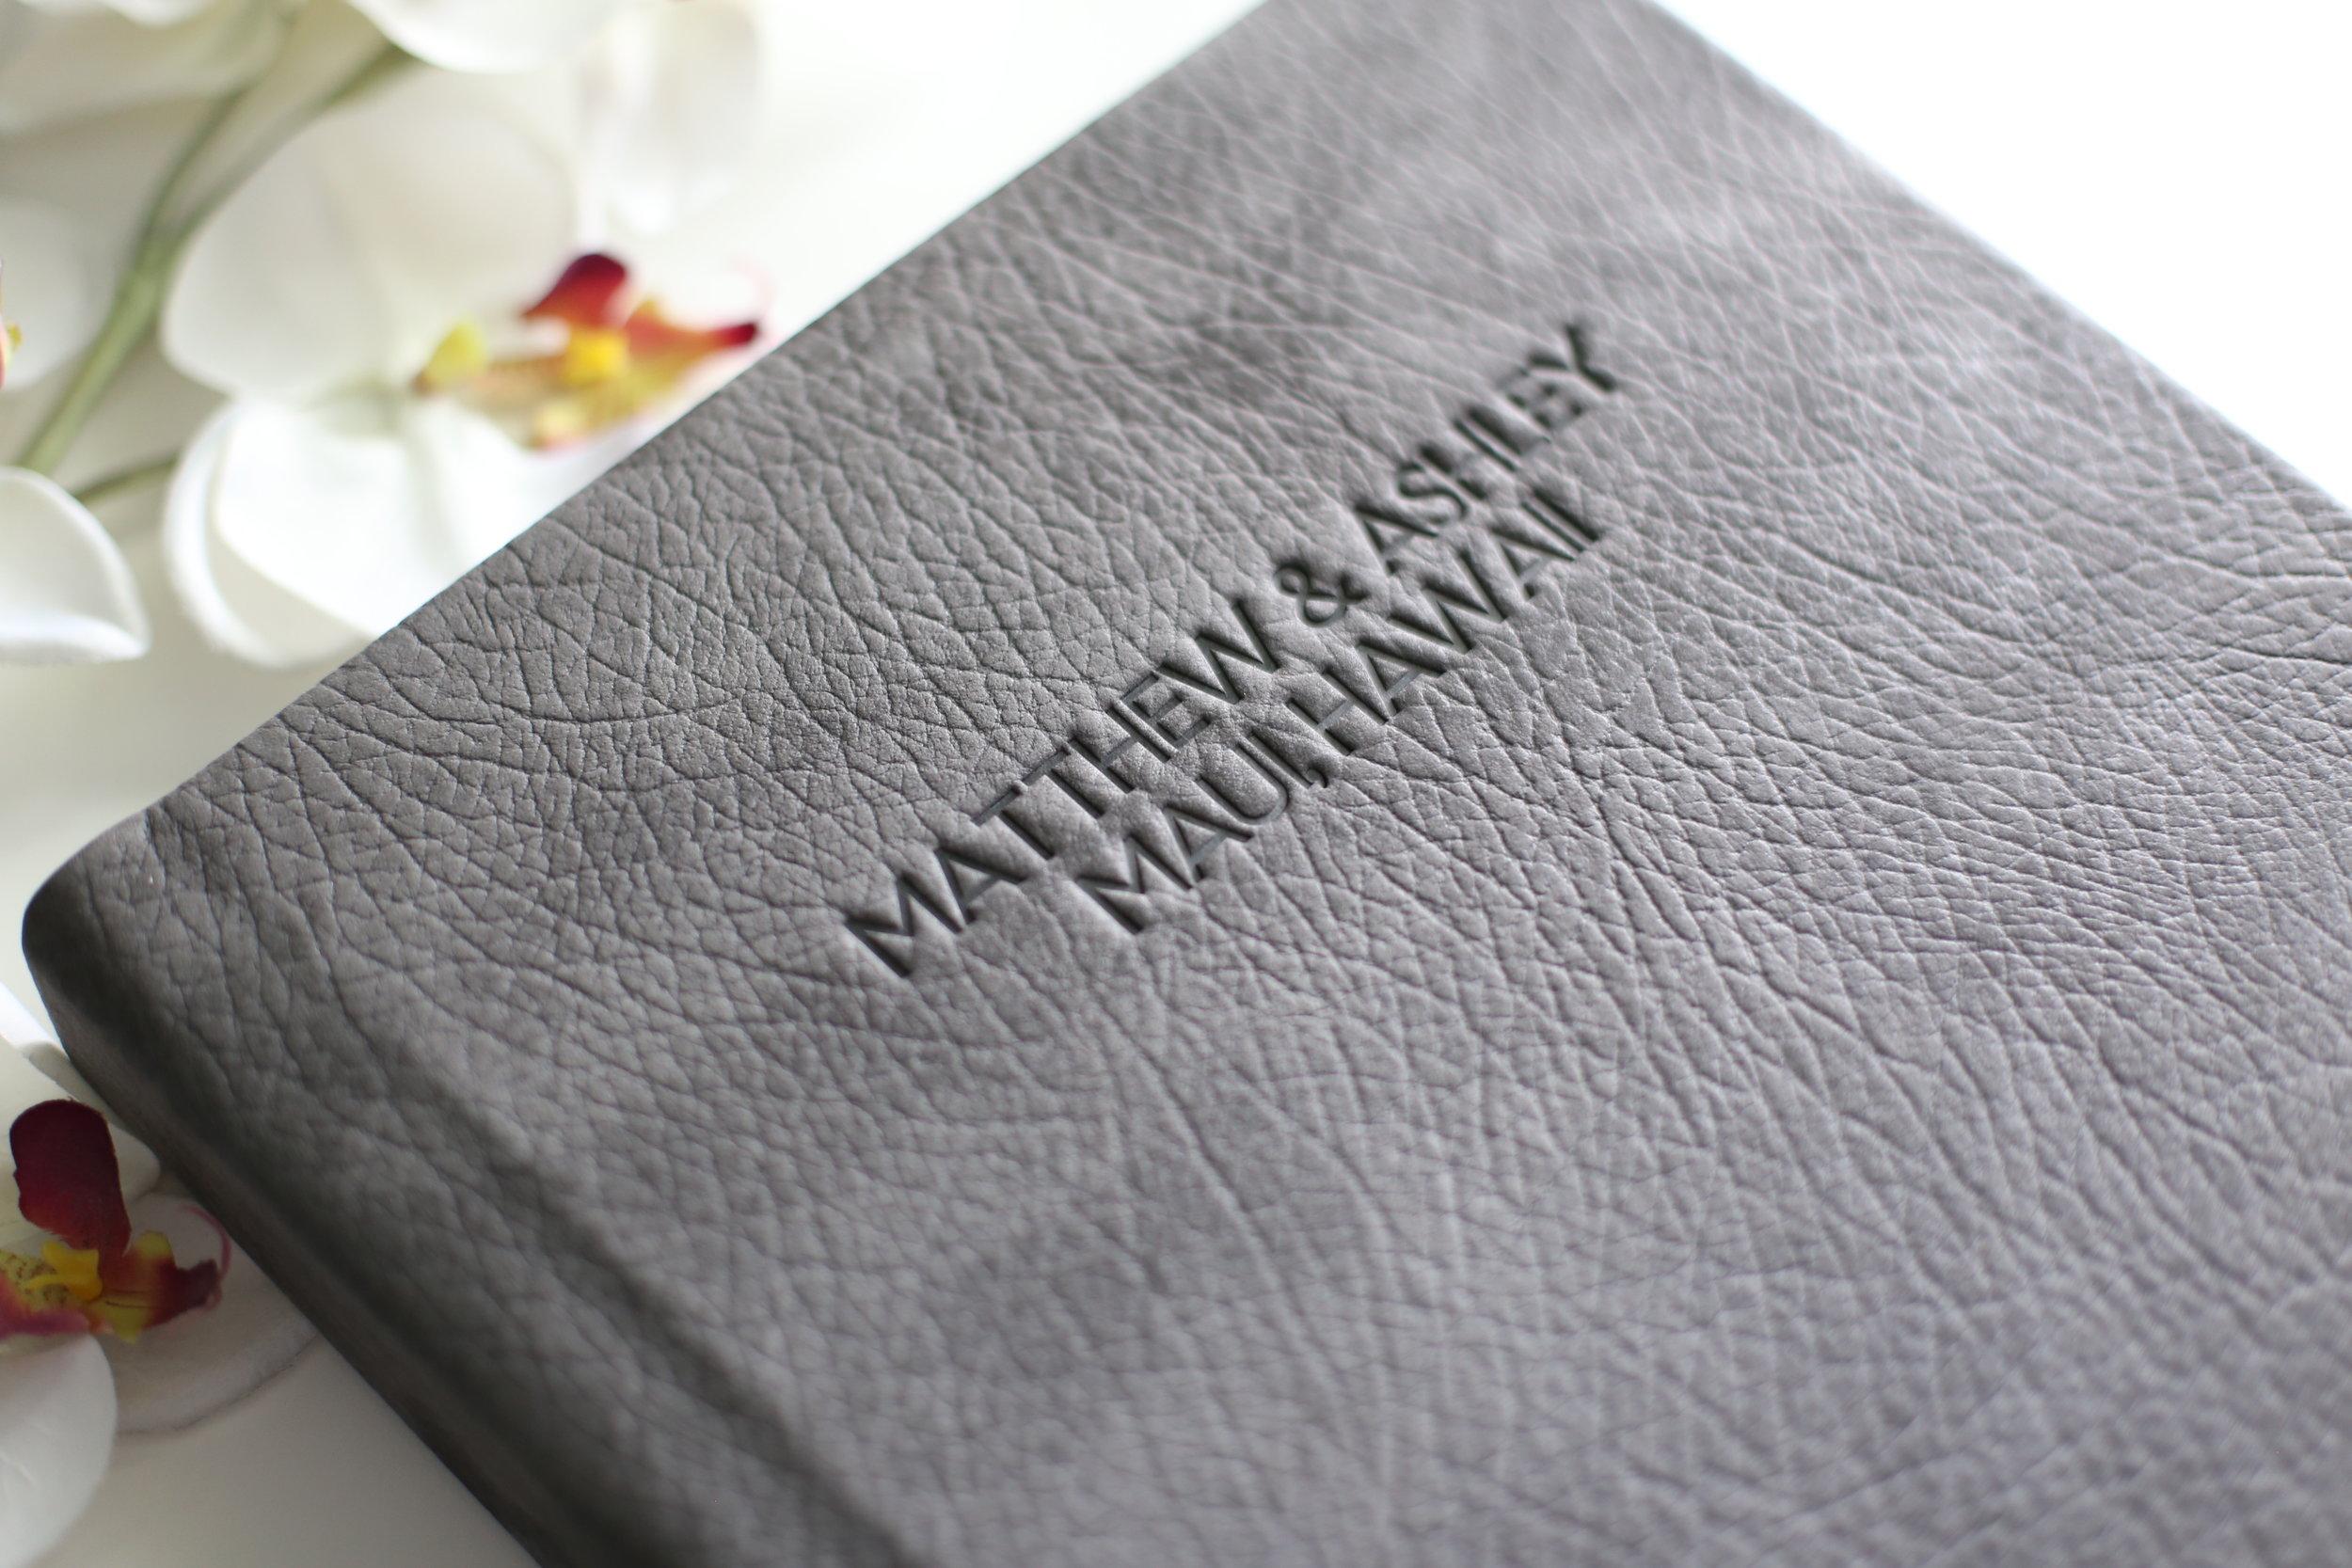 wedding-photographer-offering-albums-prints-nashville05.JPG